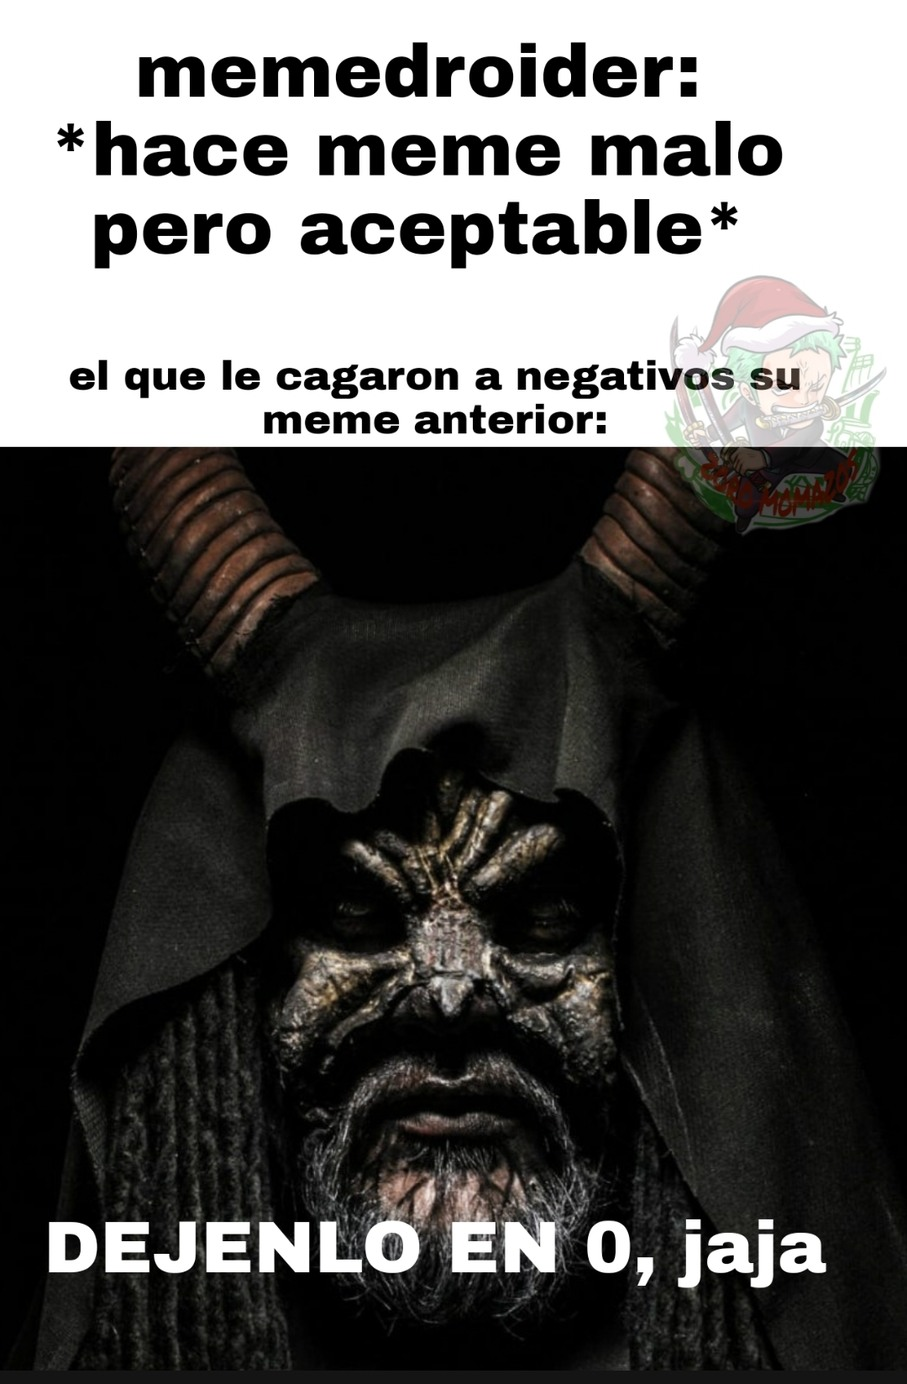 Imagenes de miedo google buscar - meme